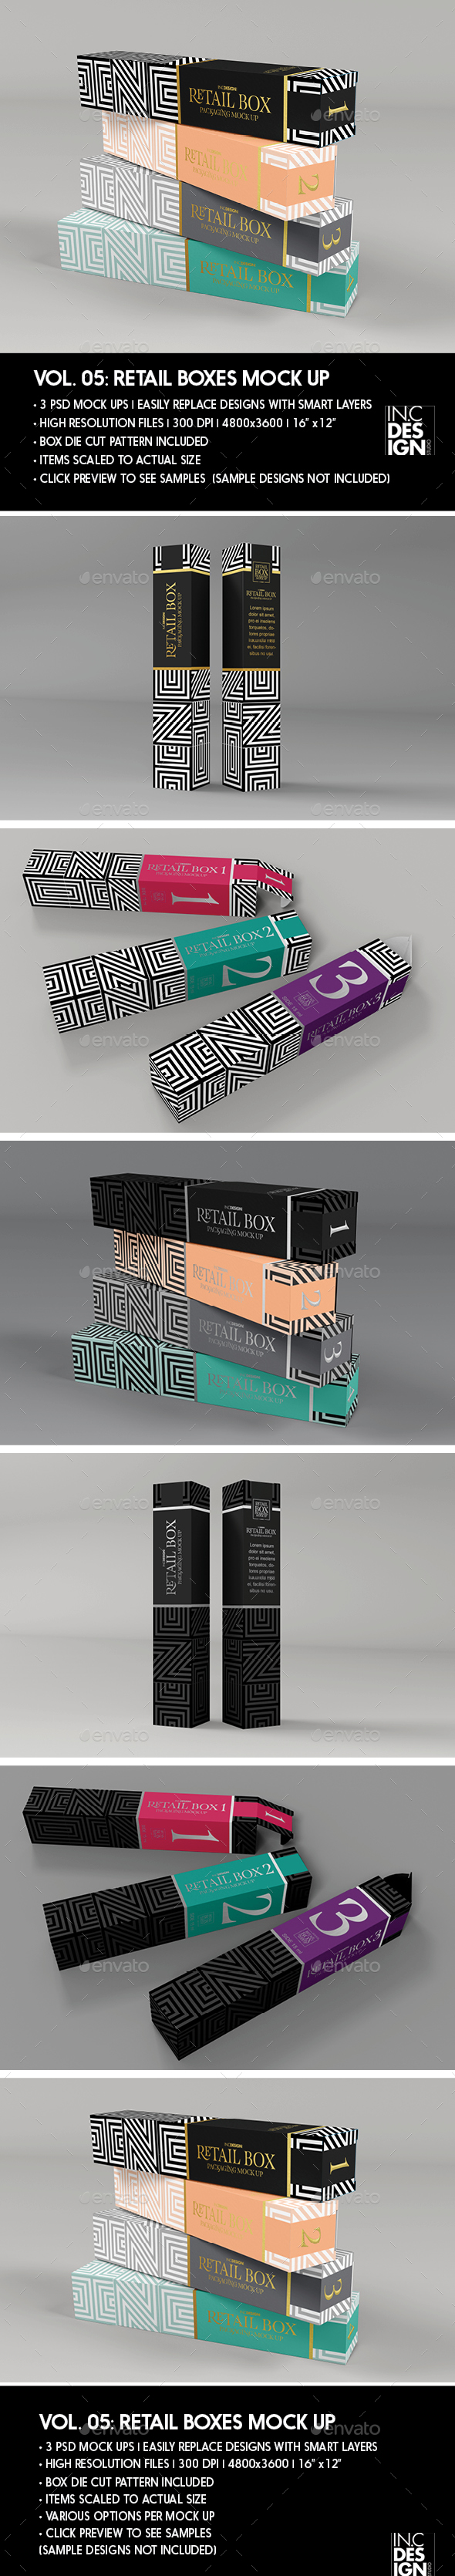 Retail Boxes Vol.5: Narrow Cosmetic or Perfume Box Packaging Mock Ups - Beauty Packaging